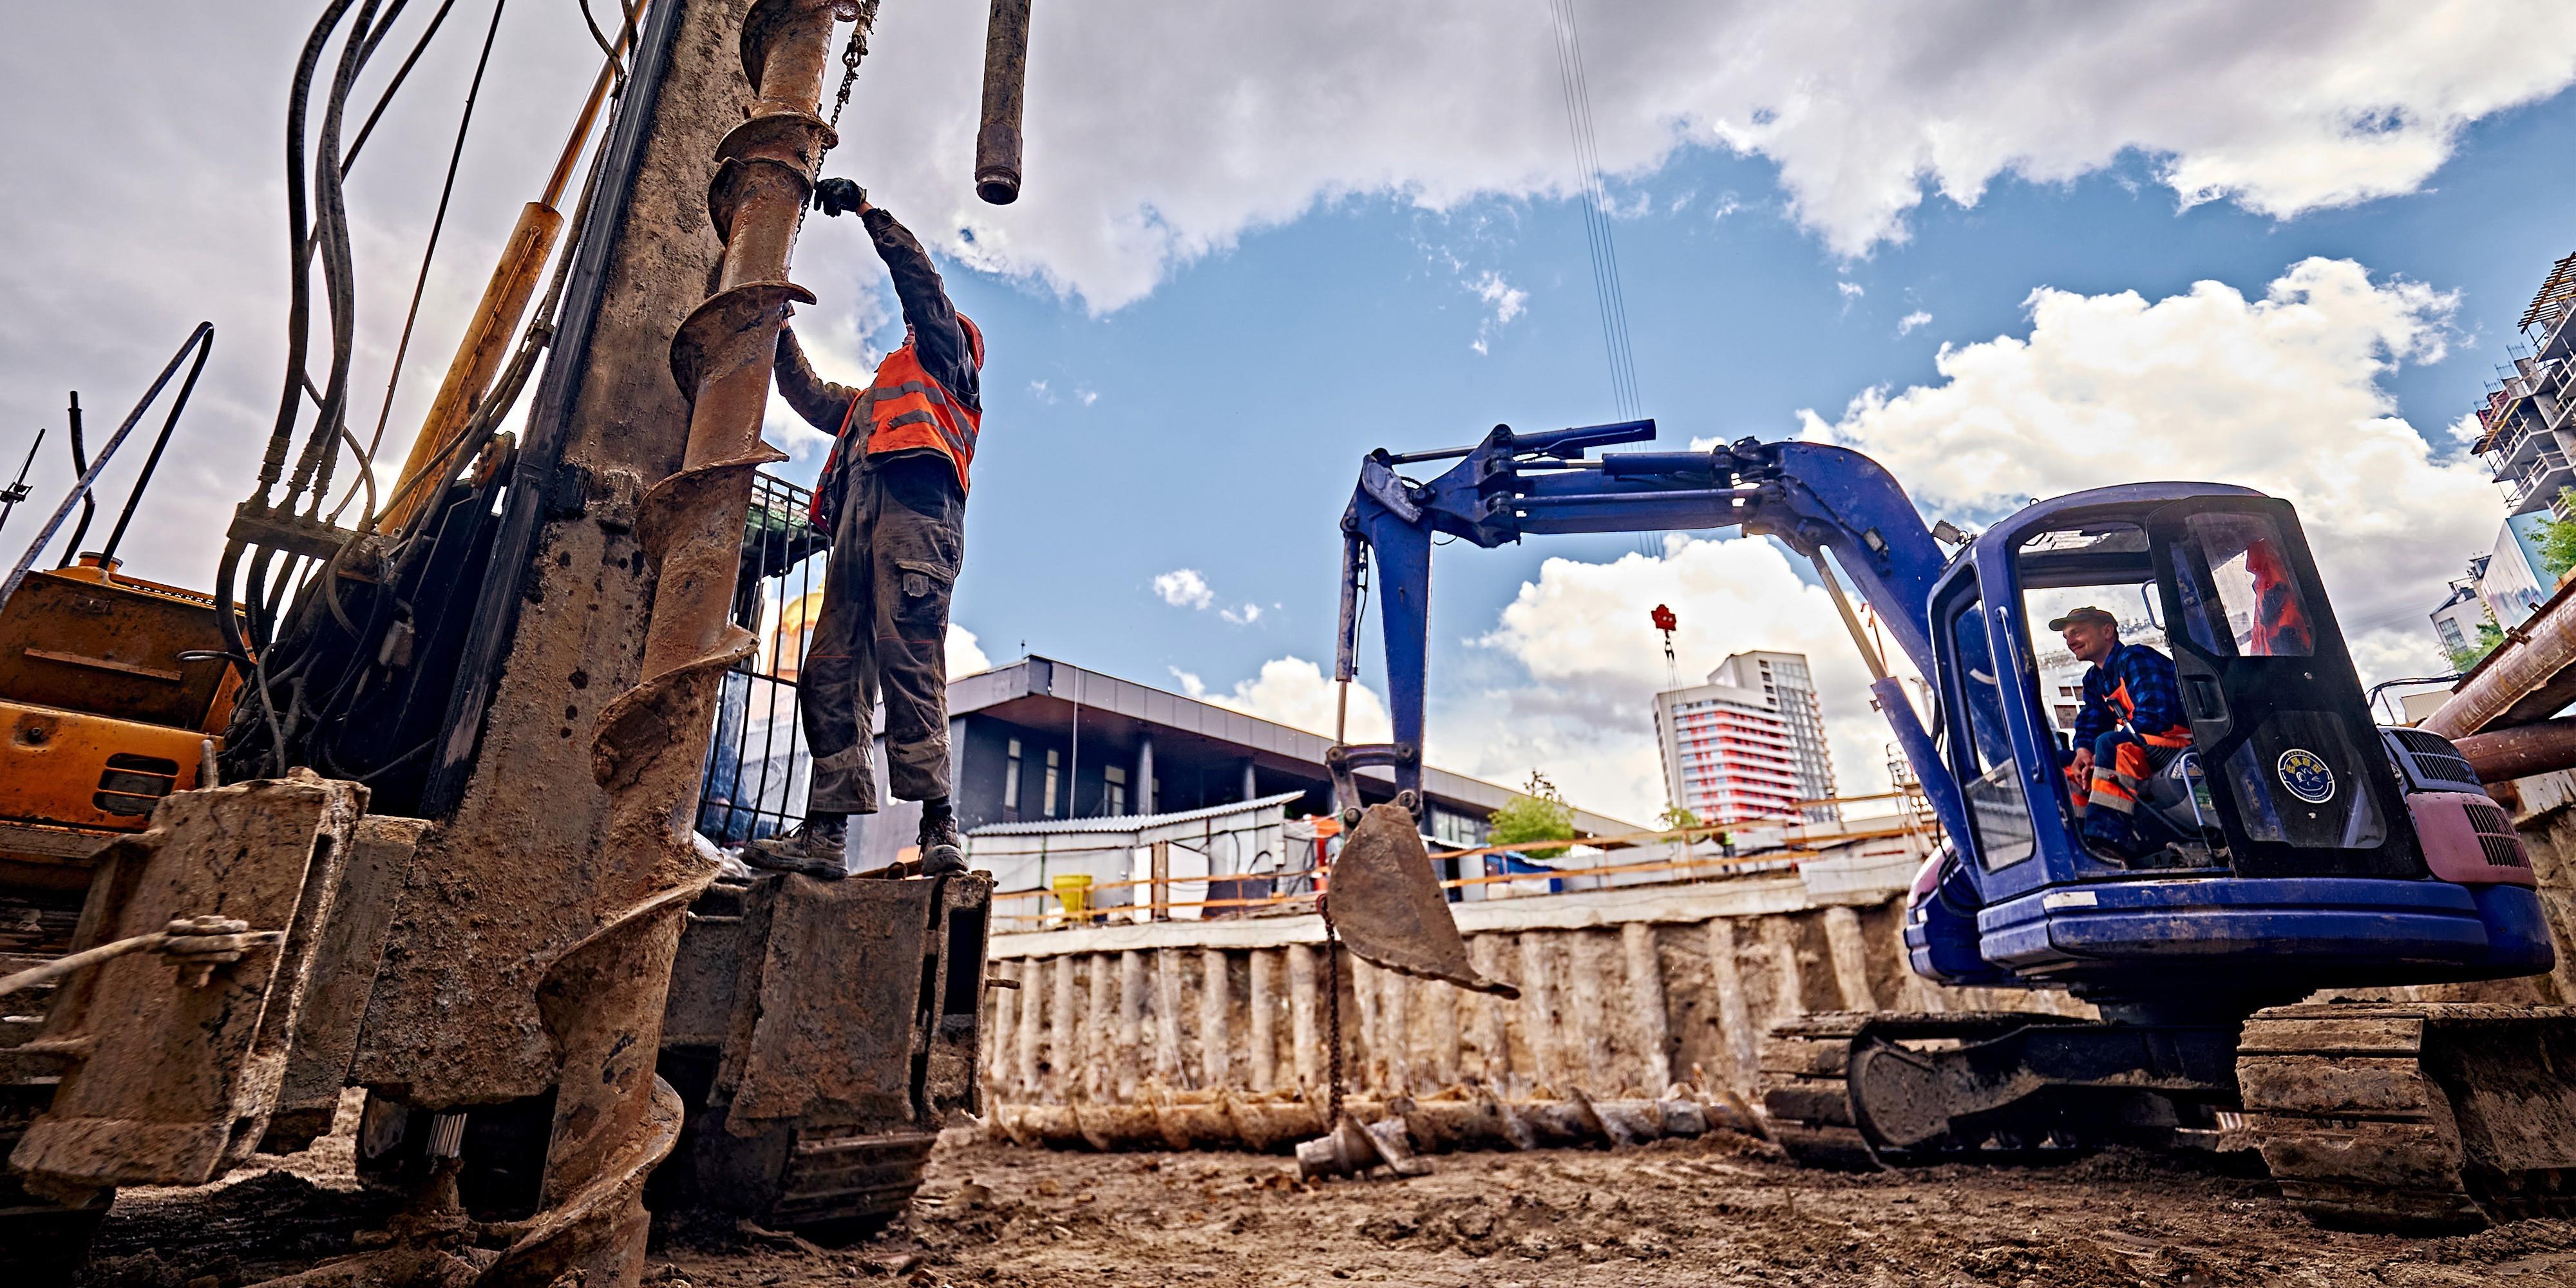 CONSTRUCTION PROGRESS S1 TERMINAL. MAY 2020